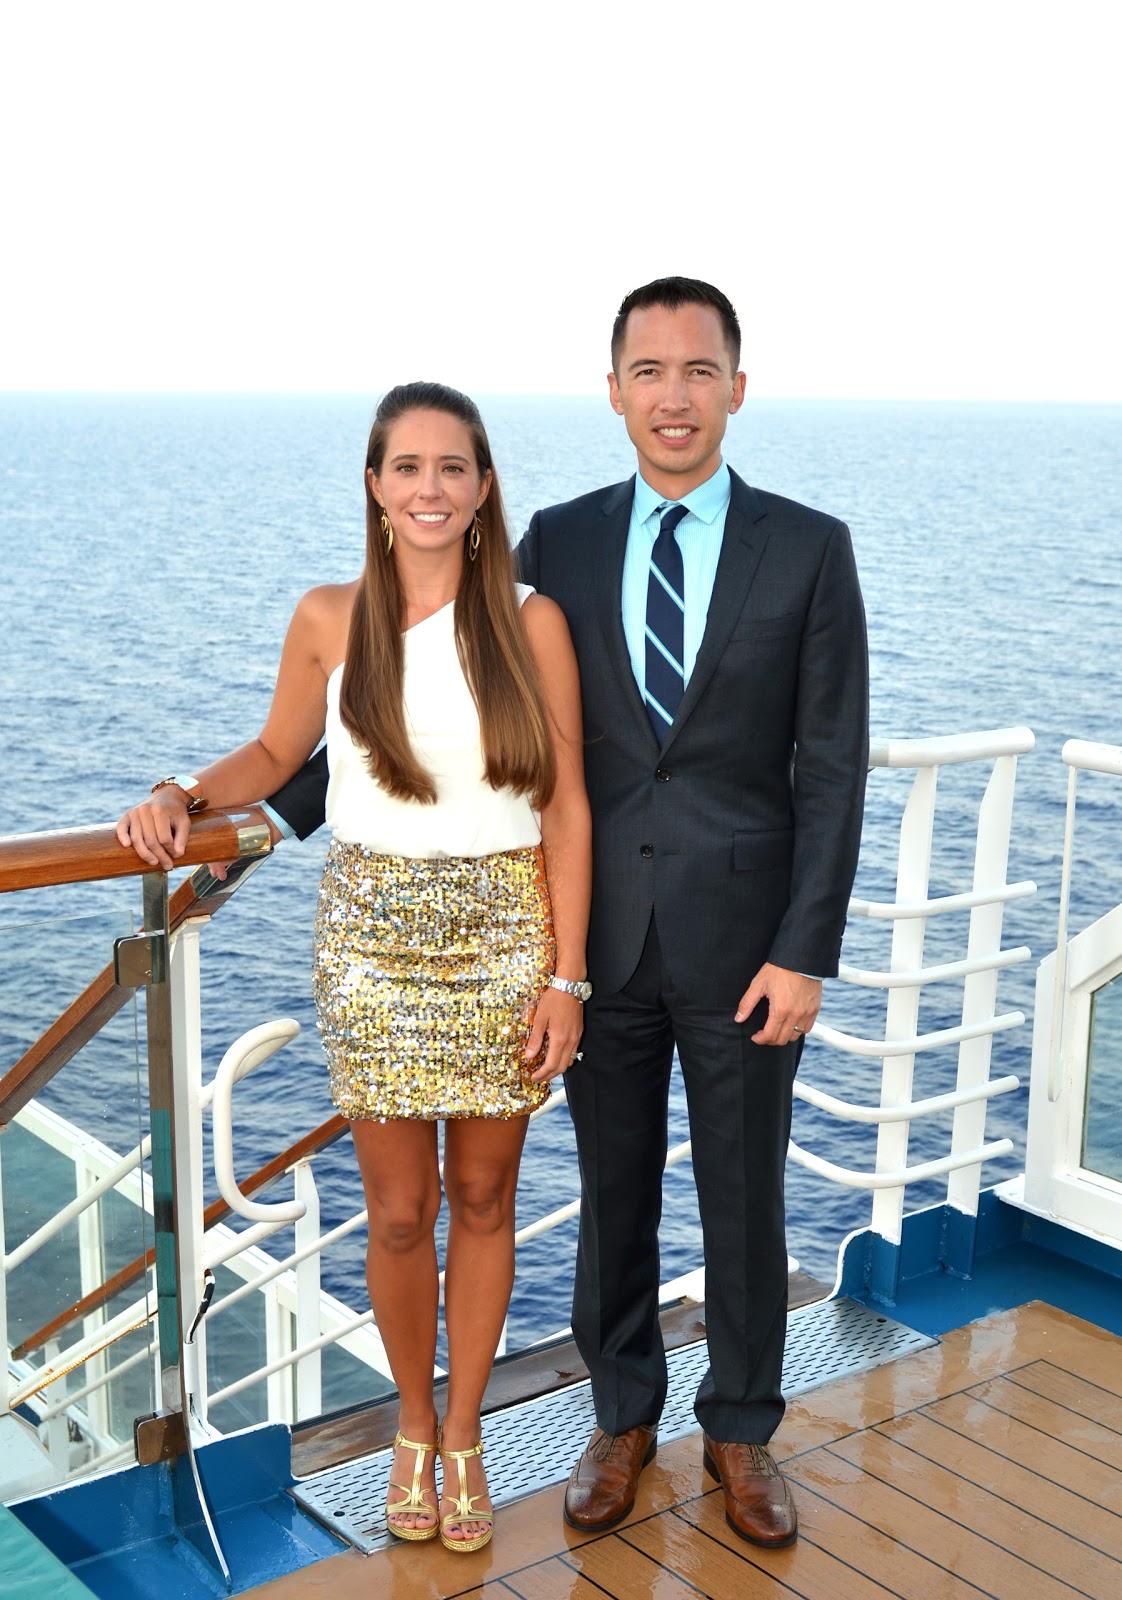 Carnival Cruise 4 Day Dress Code 360 Luxury Cruises Greek Islands Holidays